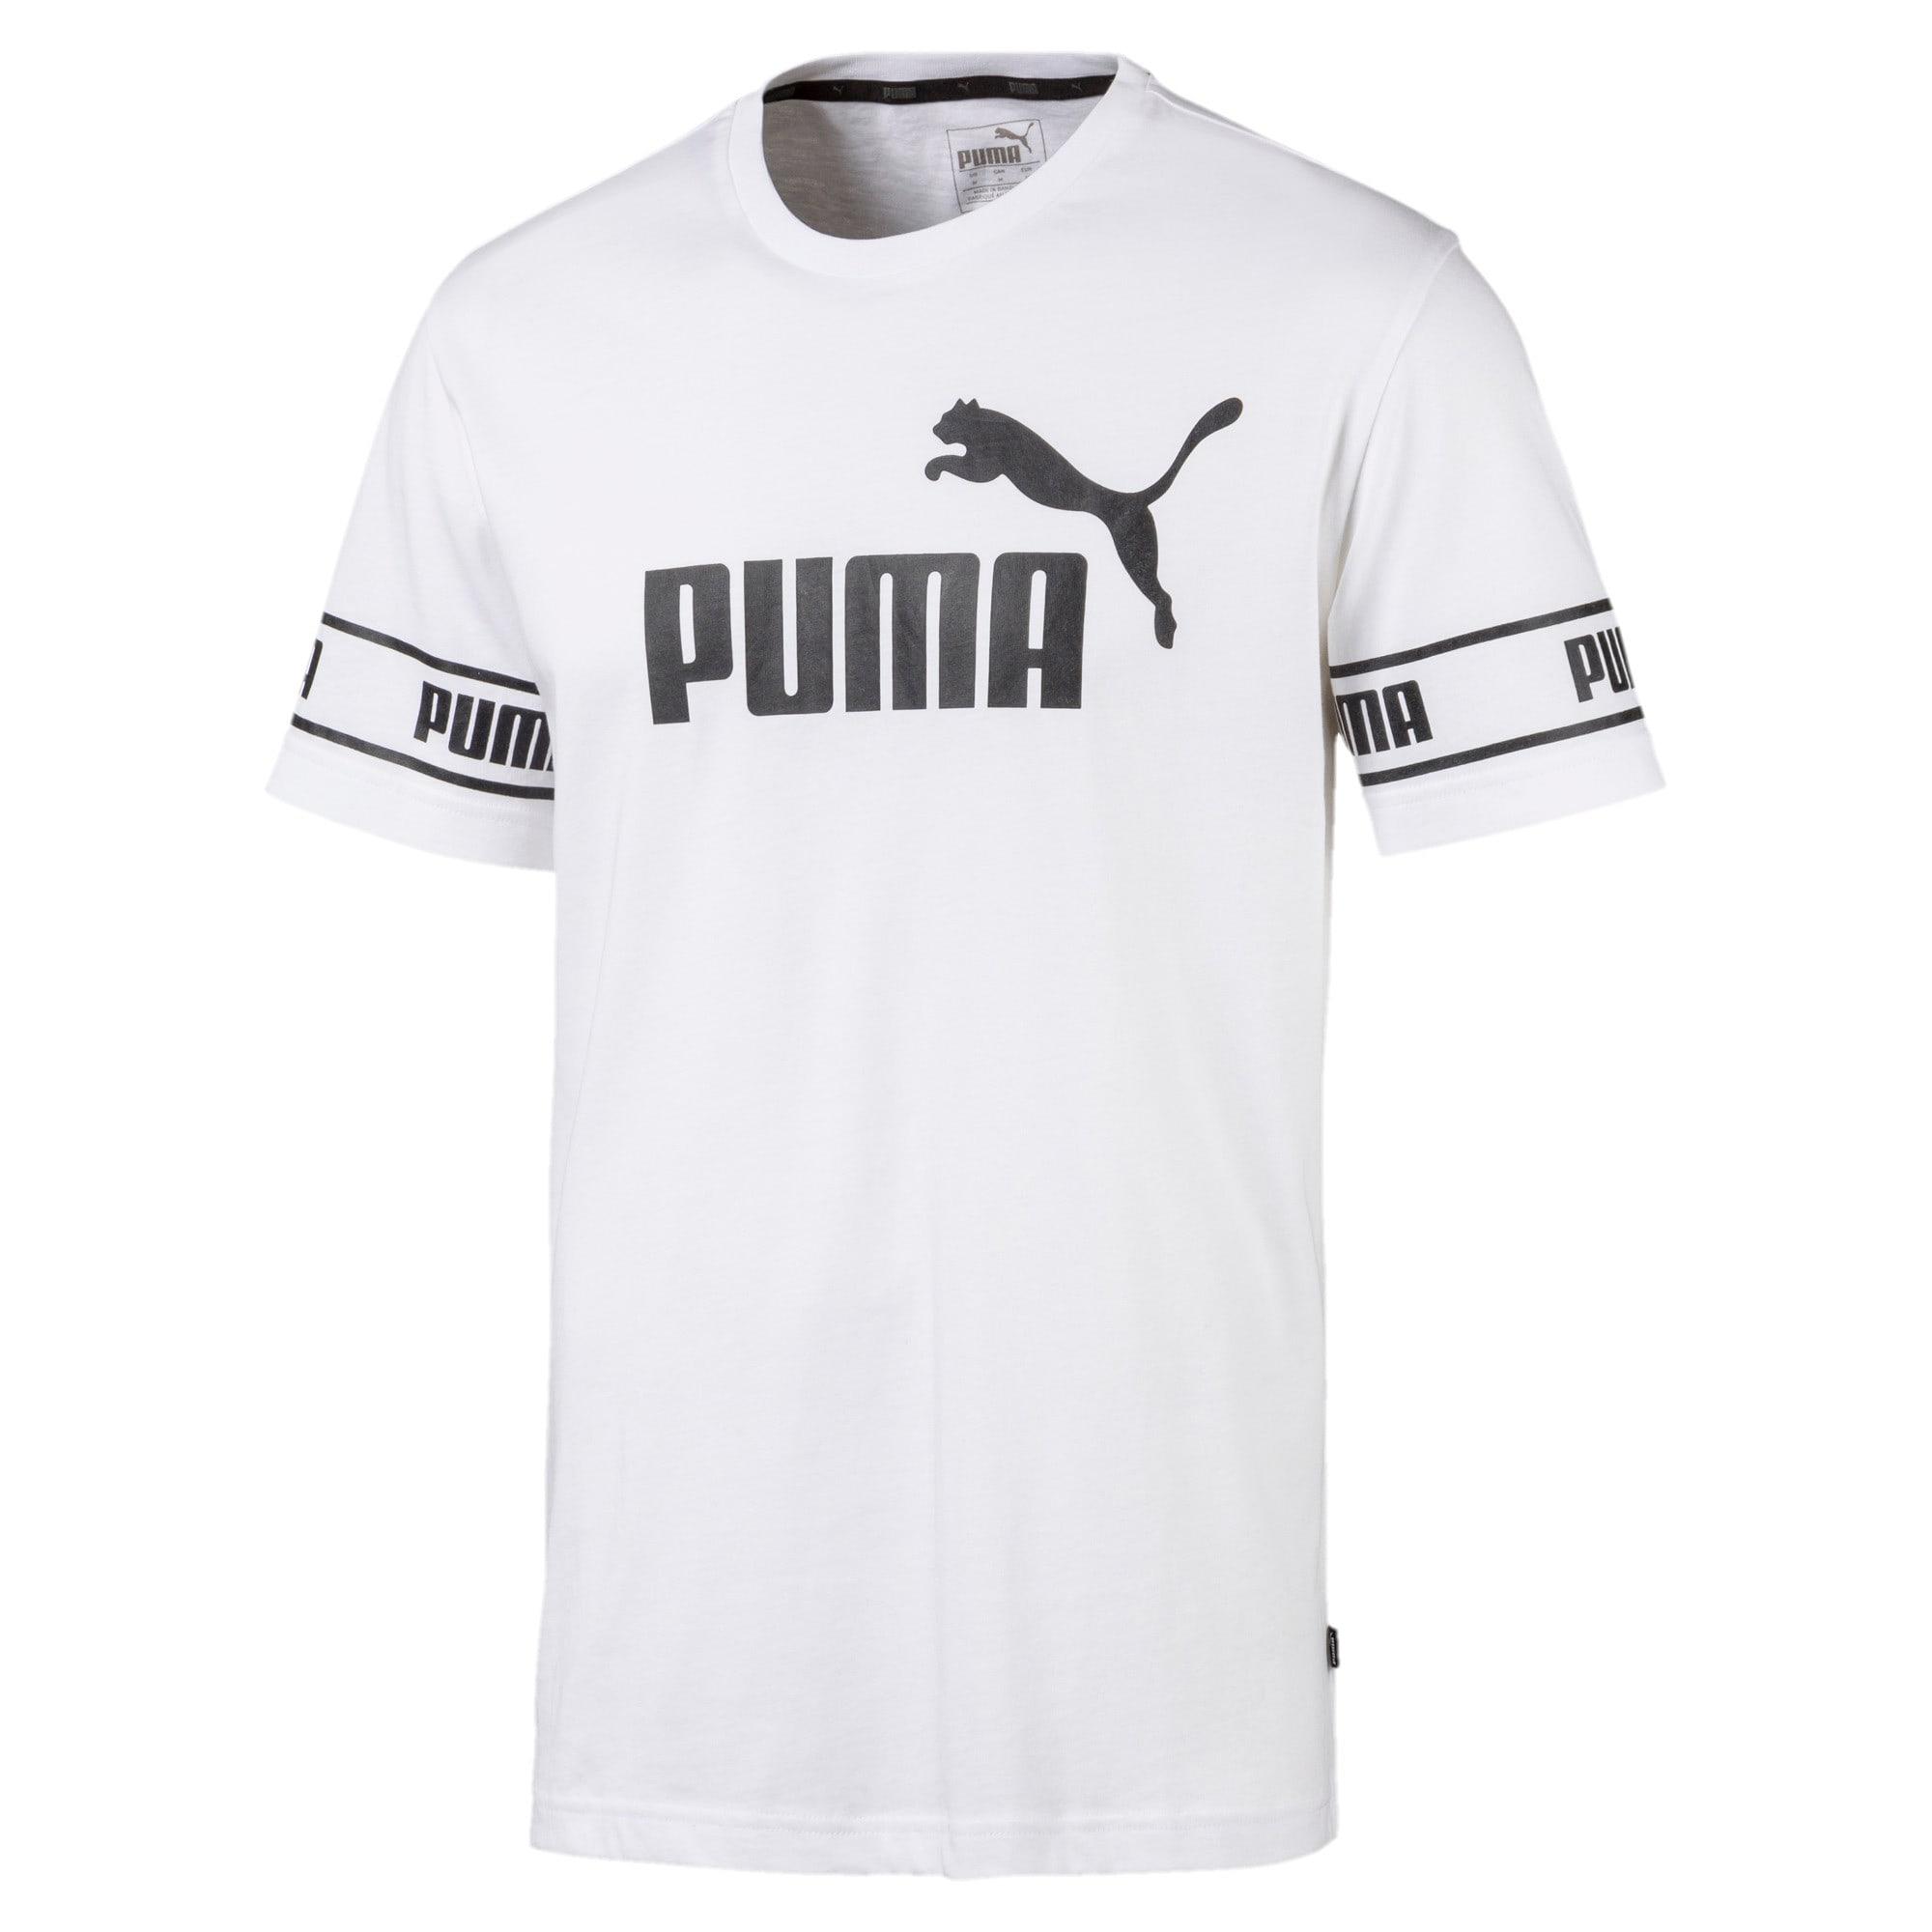 Thumbnail 4 of Amplified Men's Big Logo Tee, Puma White, medium